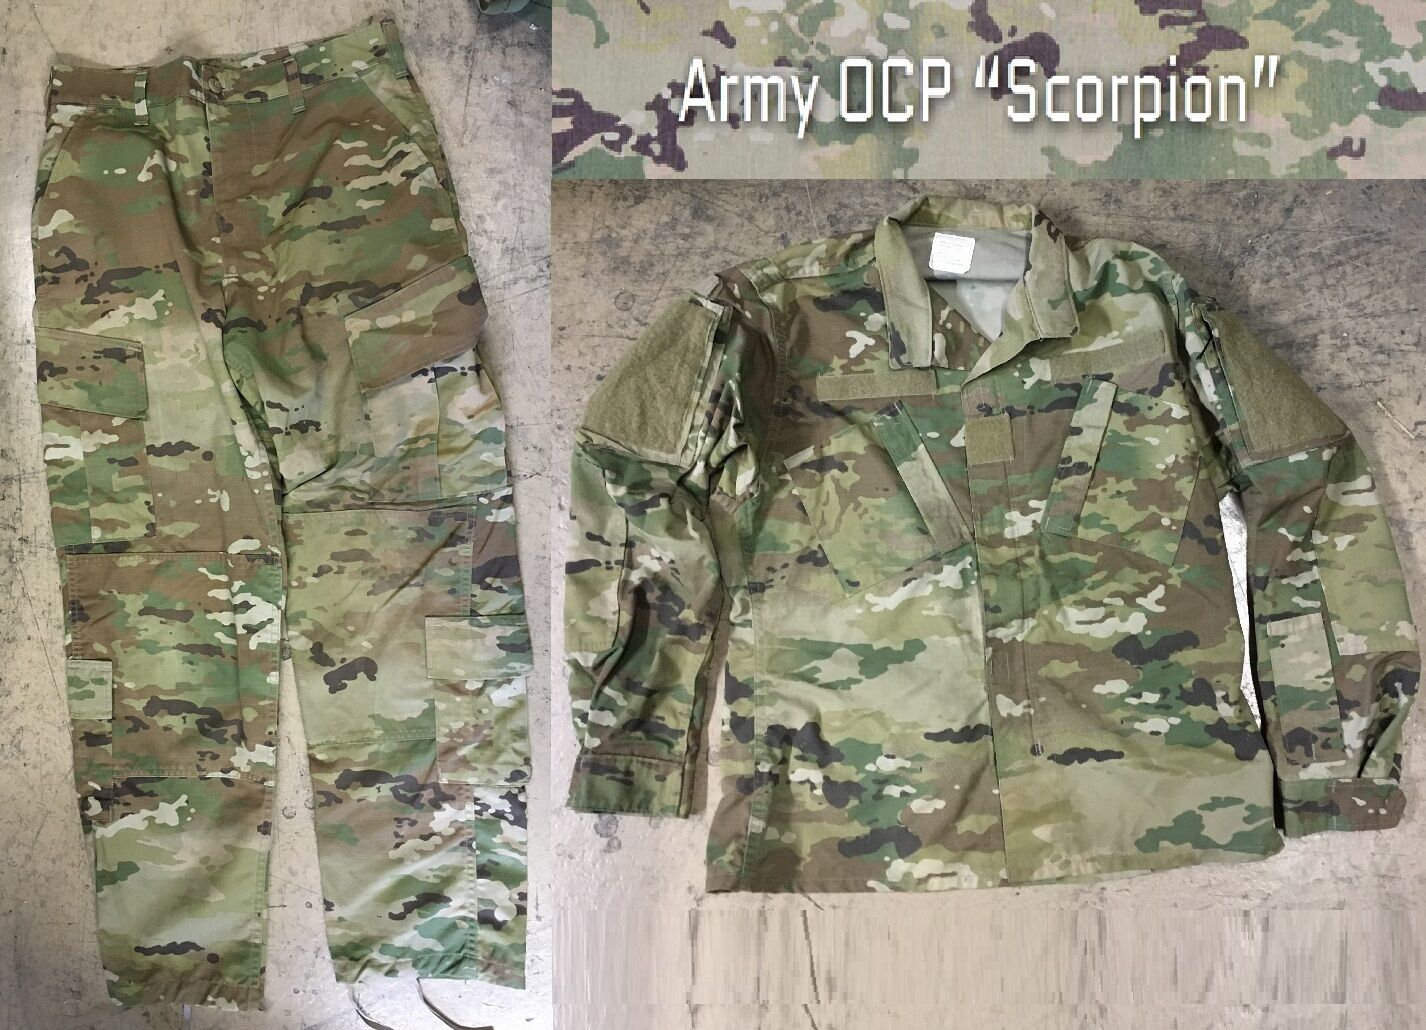 Us Army ocp acu Scorpion w2 Combat Uniform CAMUFLAJE GHILLIE chaqueta pantalón Small